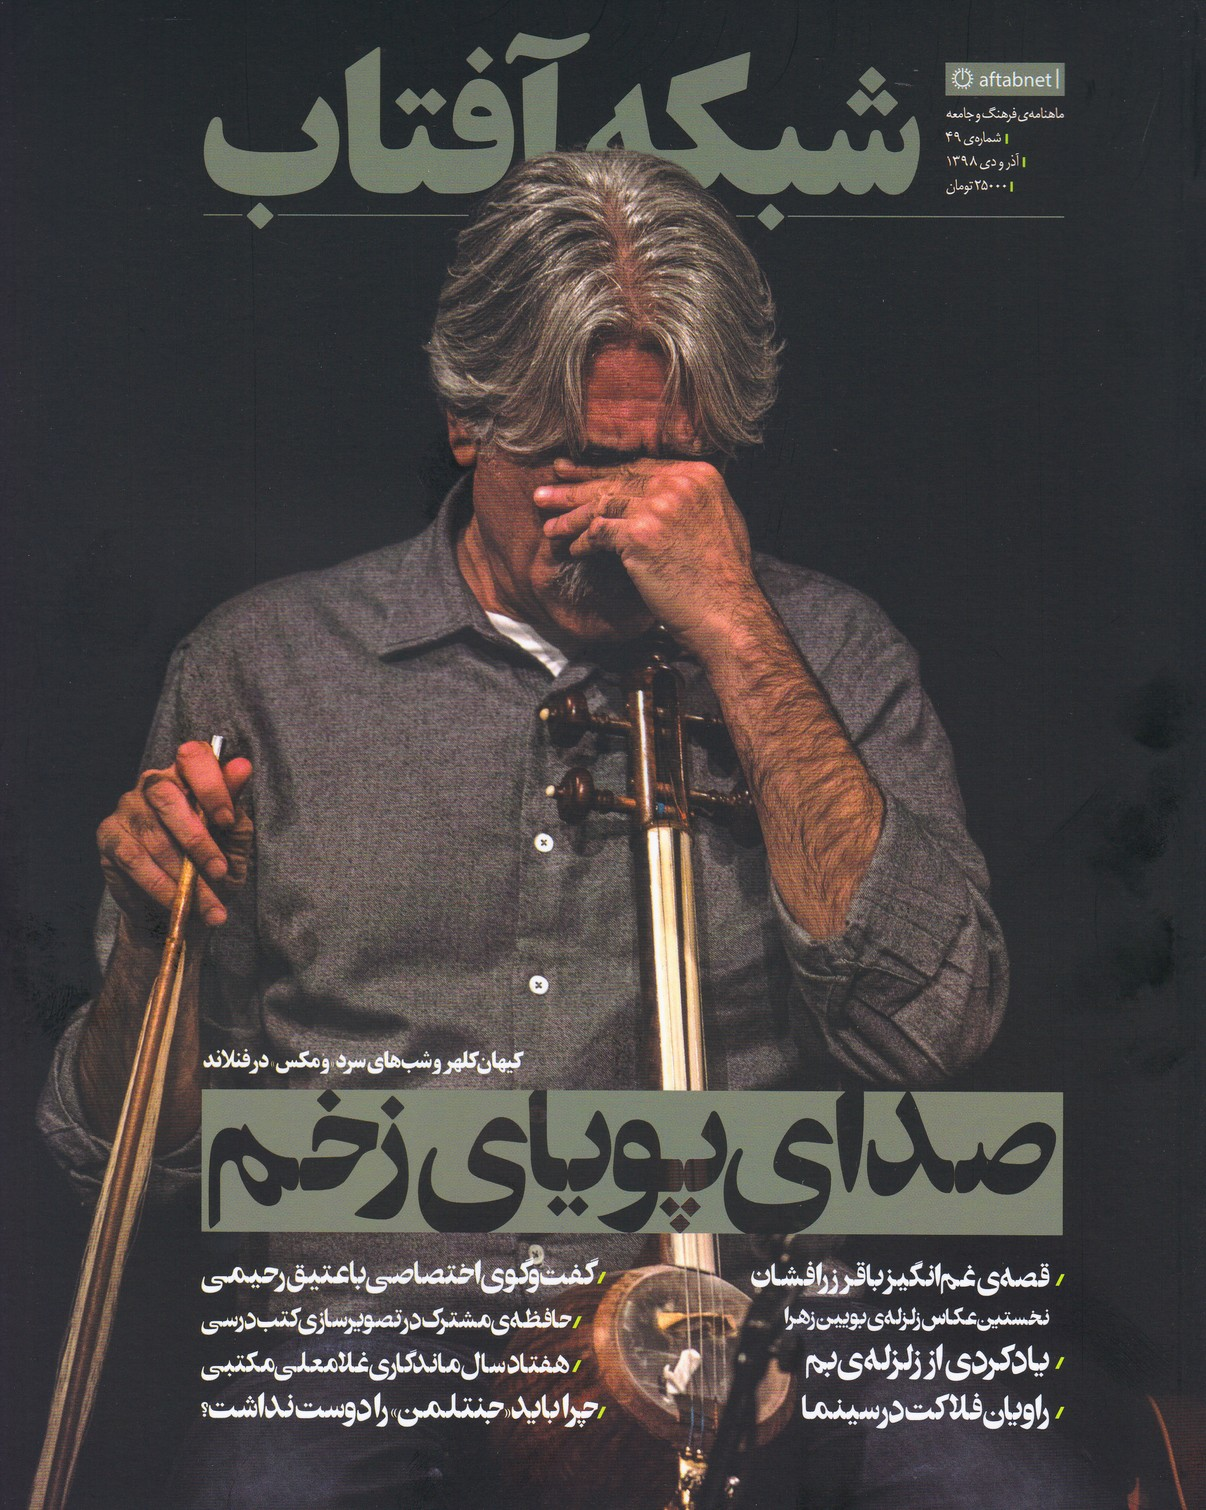 شبکه آفتاب (49) - آذر و دی98